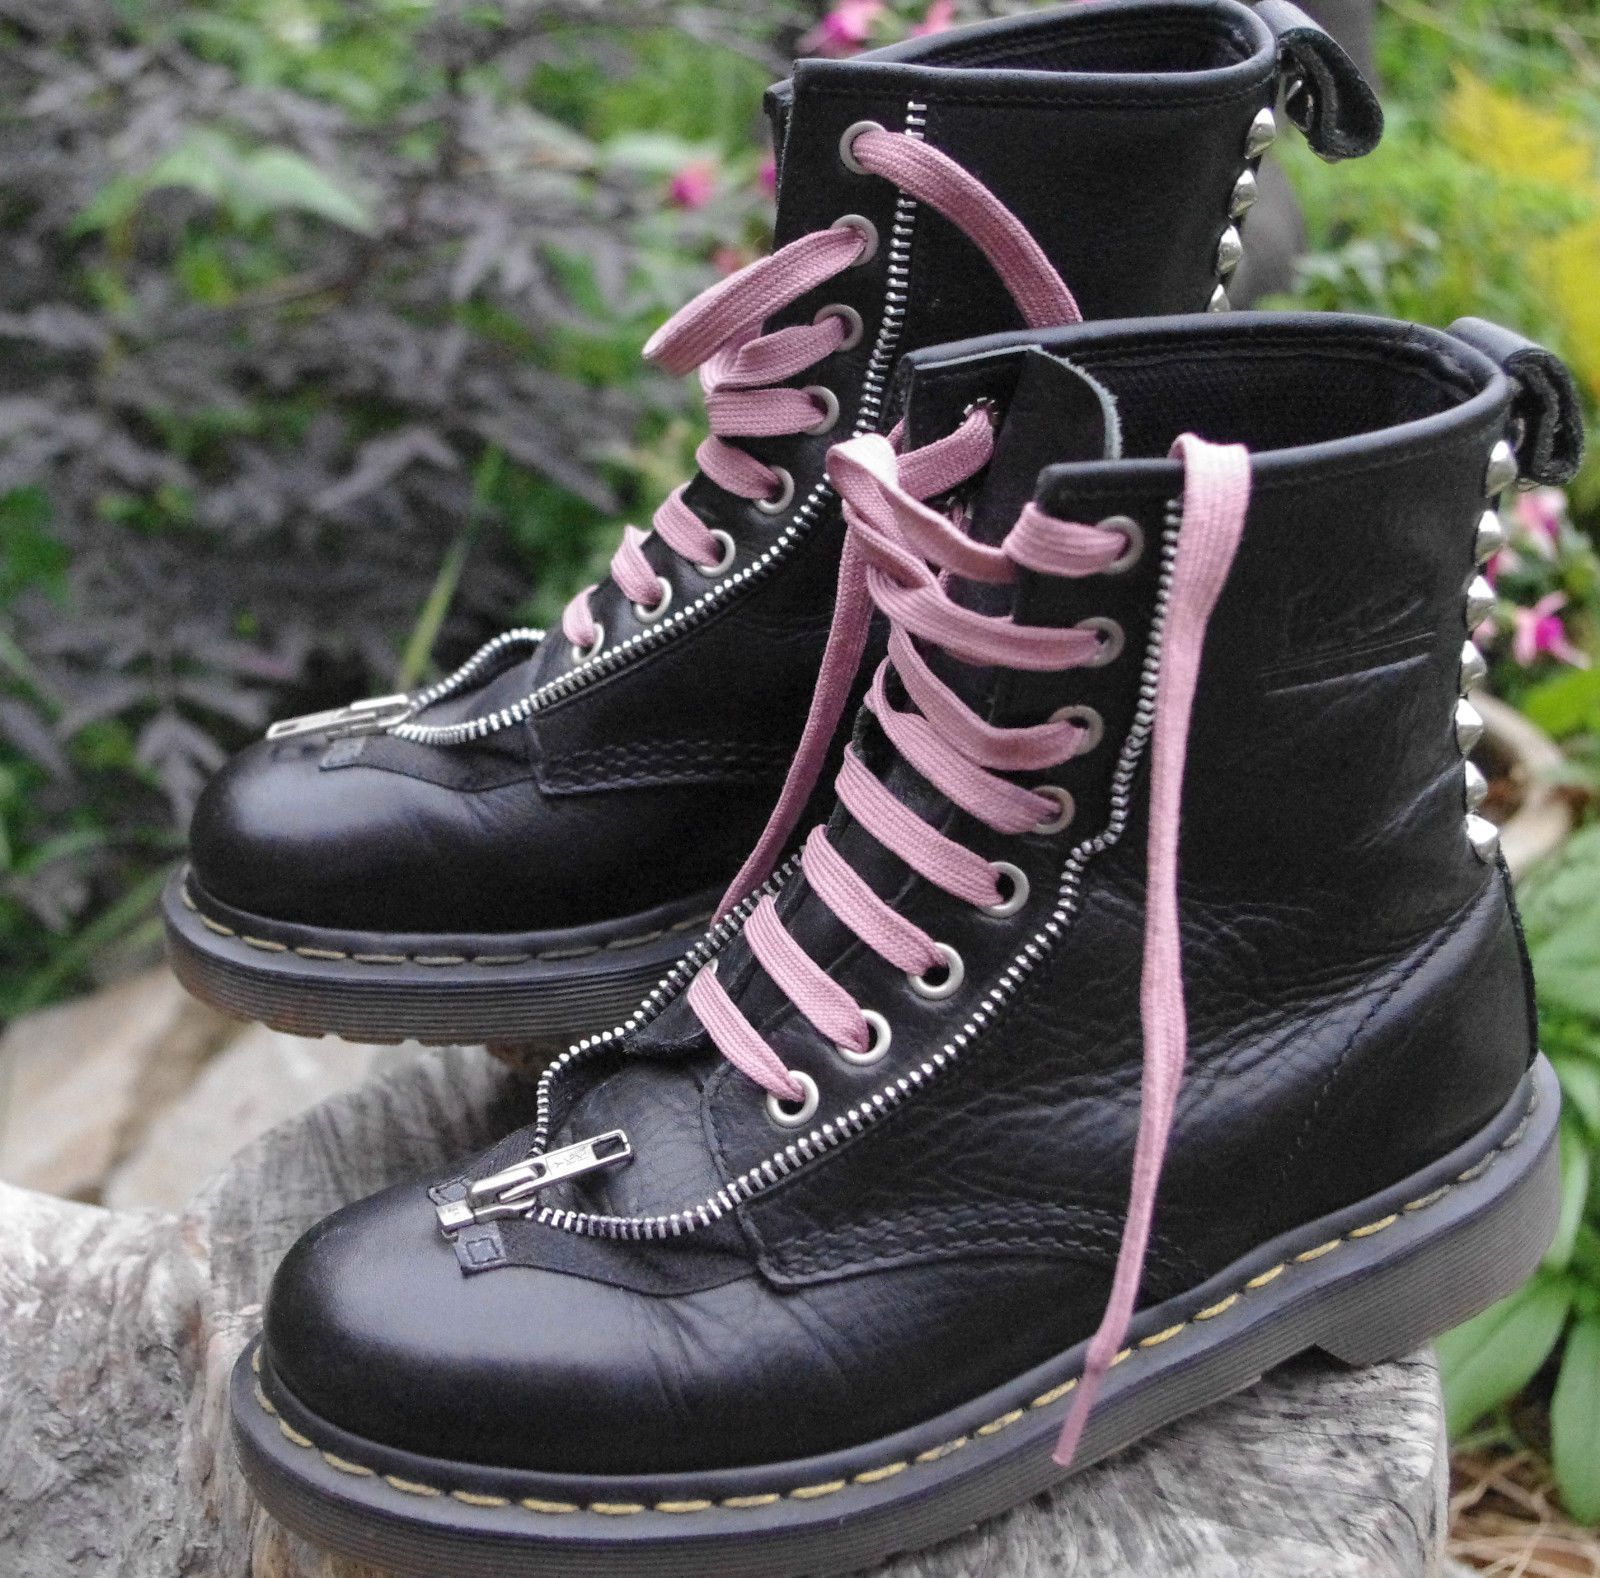 rare black dr martens boots uk 5 eu 38 silver studs and. Black Bedroom Furniture Sets. Home Design Ideas